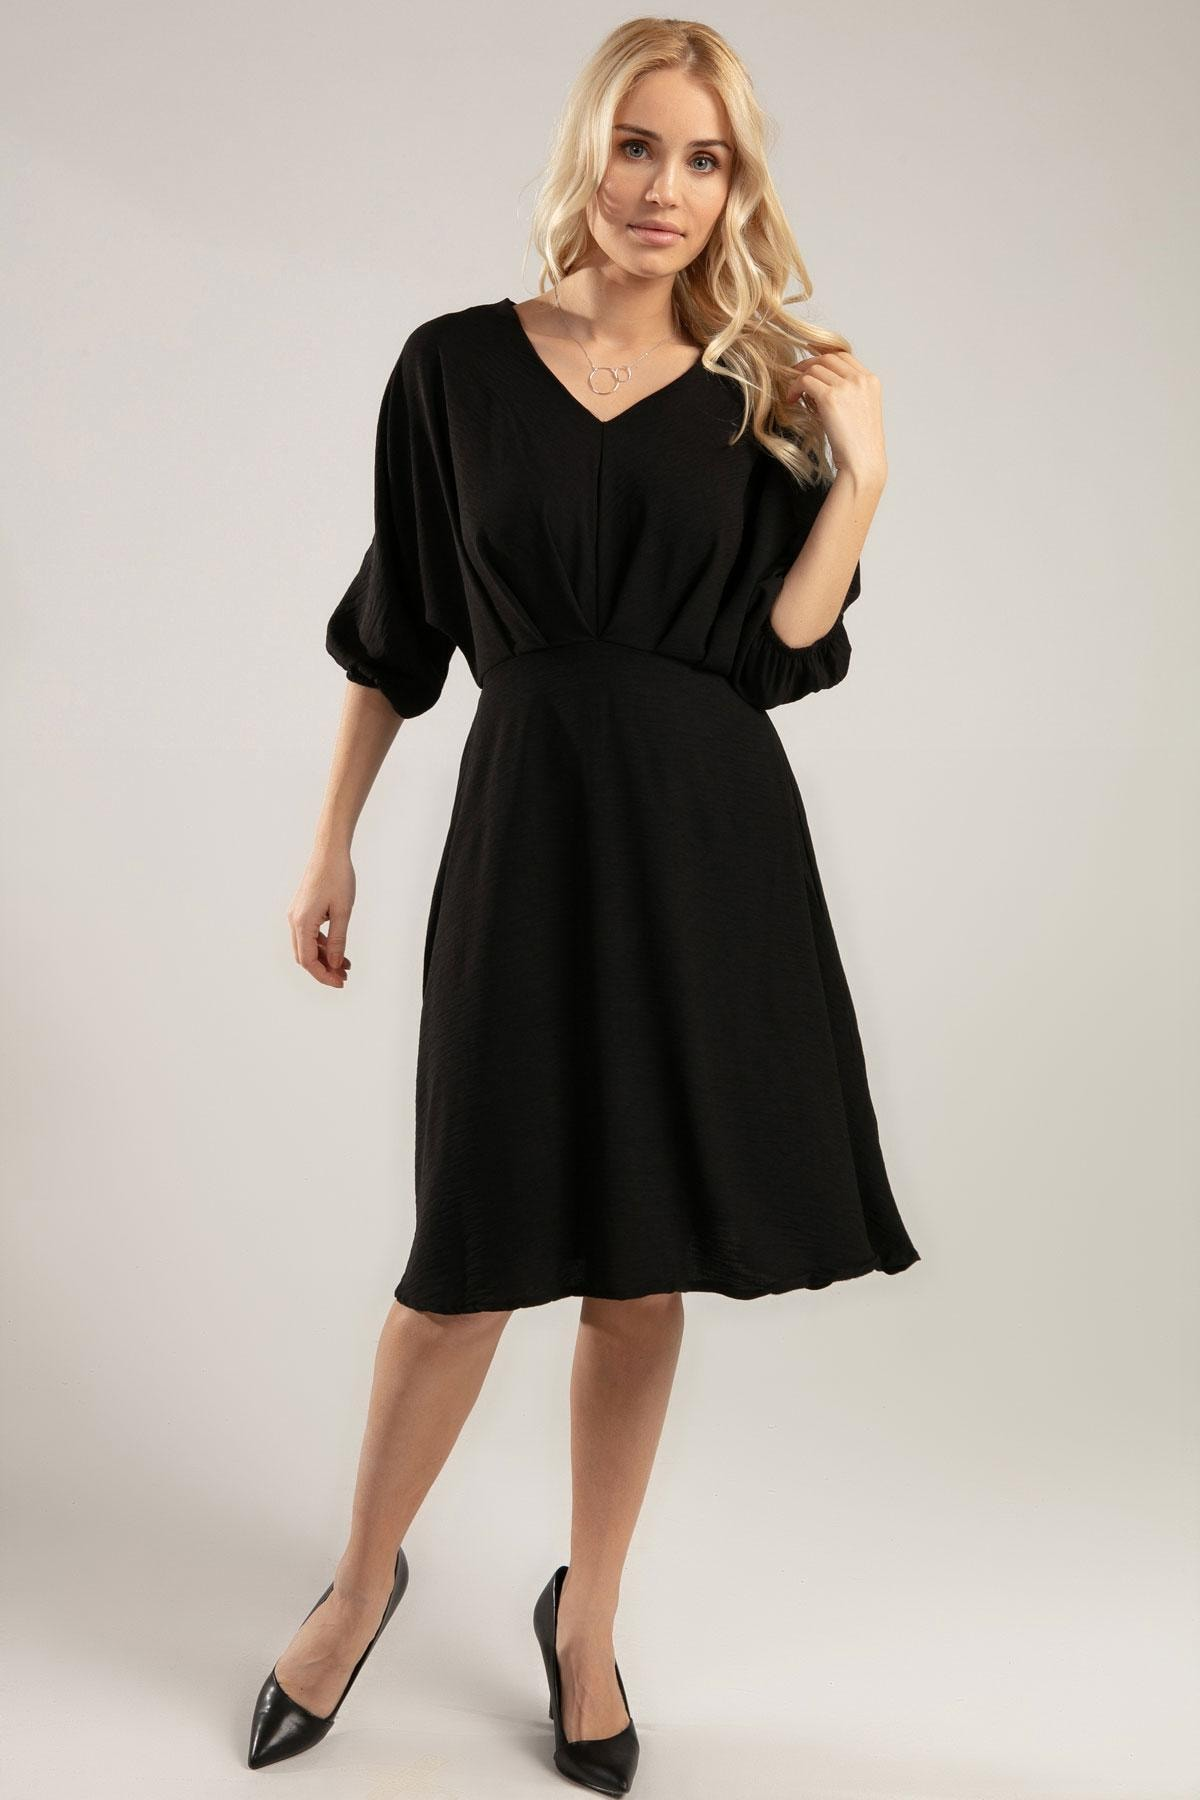 Y-London Kadın Siyah Bol Kesin V Yaka 3/4 Kol Krinkıl Elbise Y20S126-10590